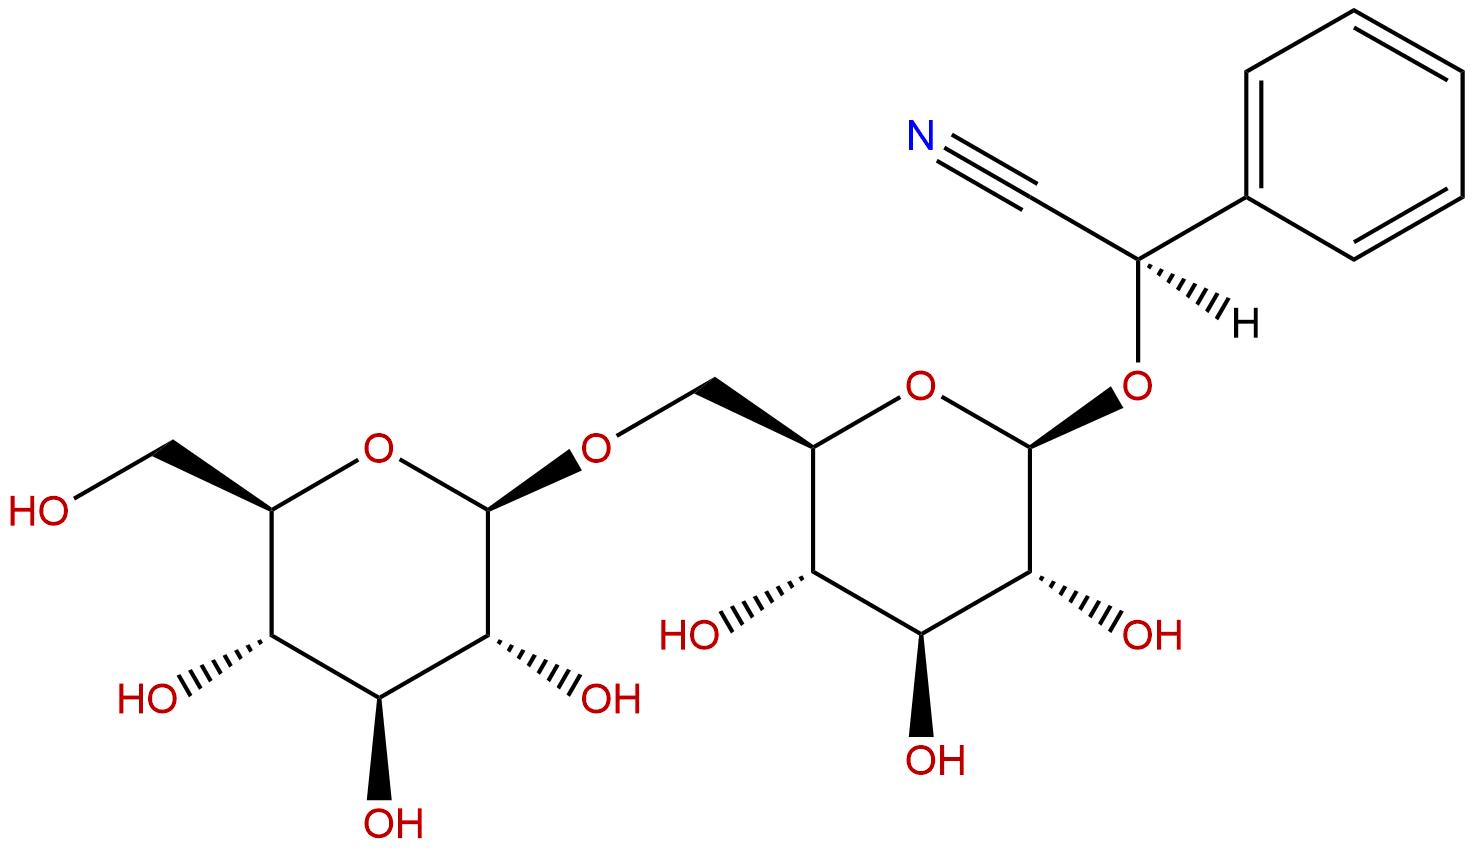 Amygdalin